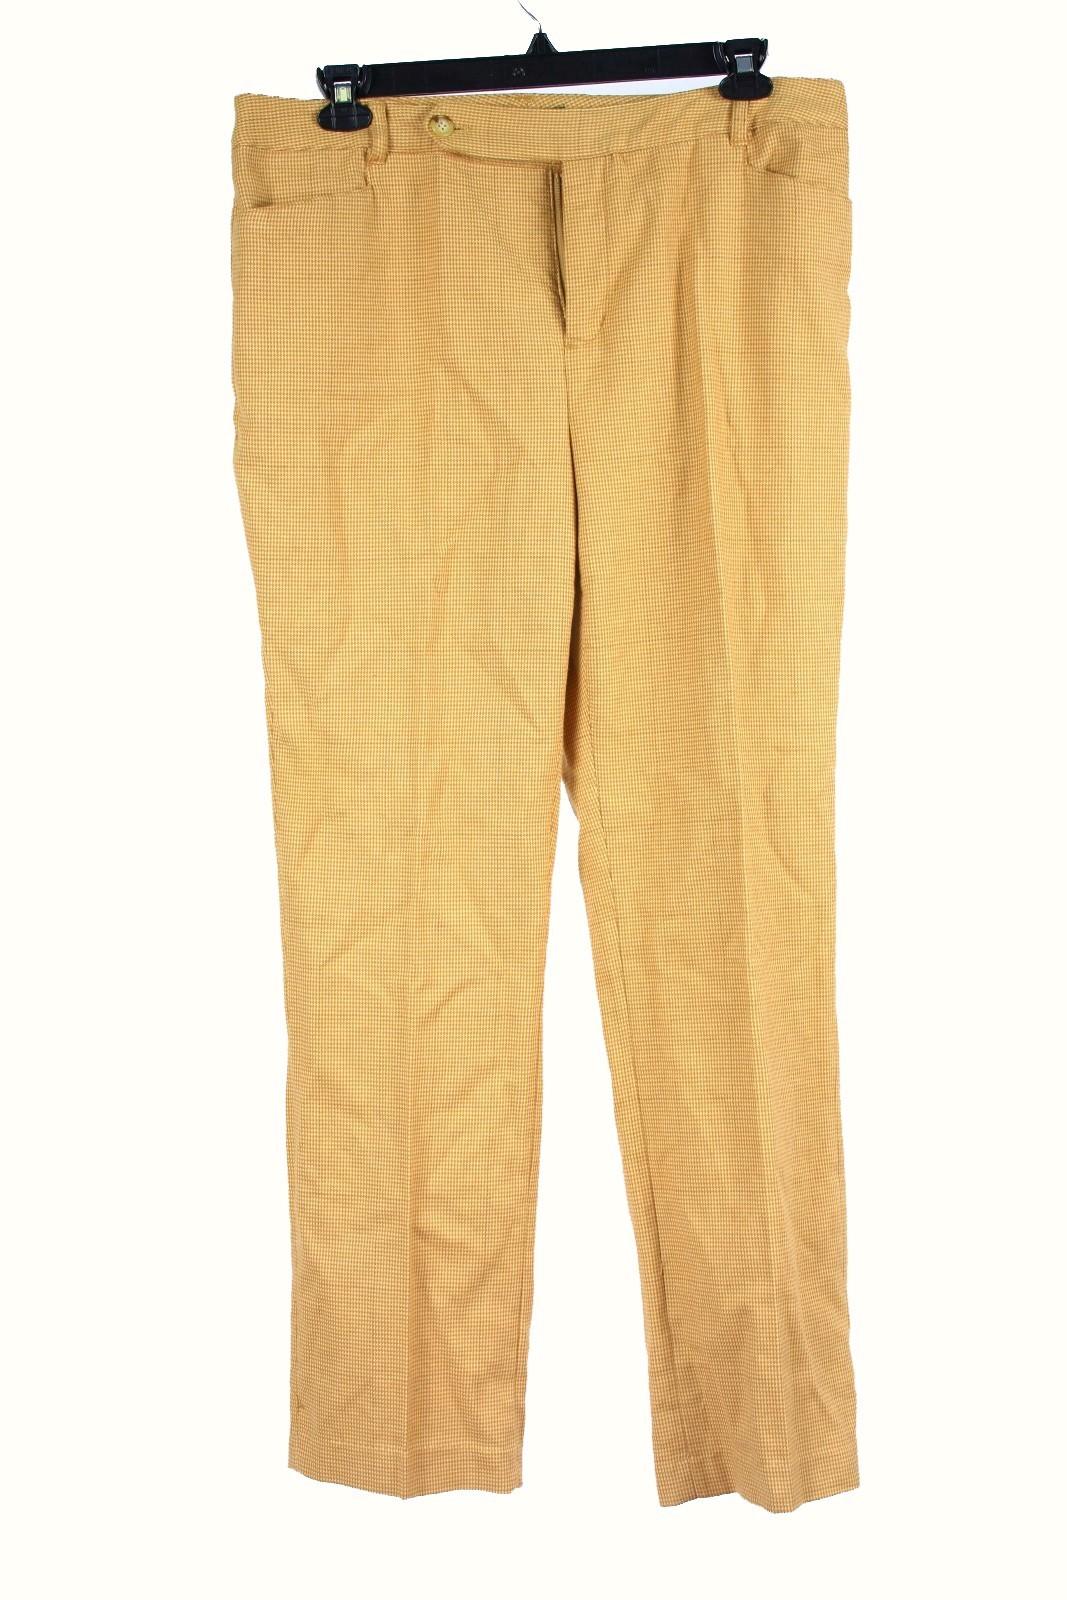 ralph lauren factory outlet coupon  ralph lauren pants